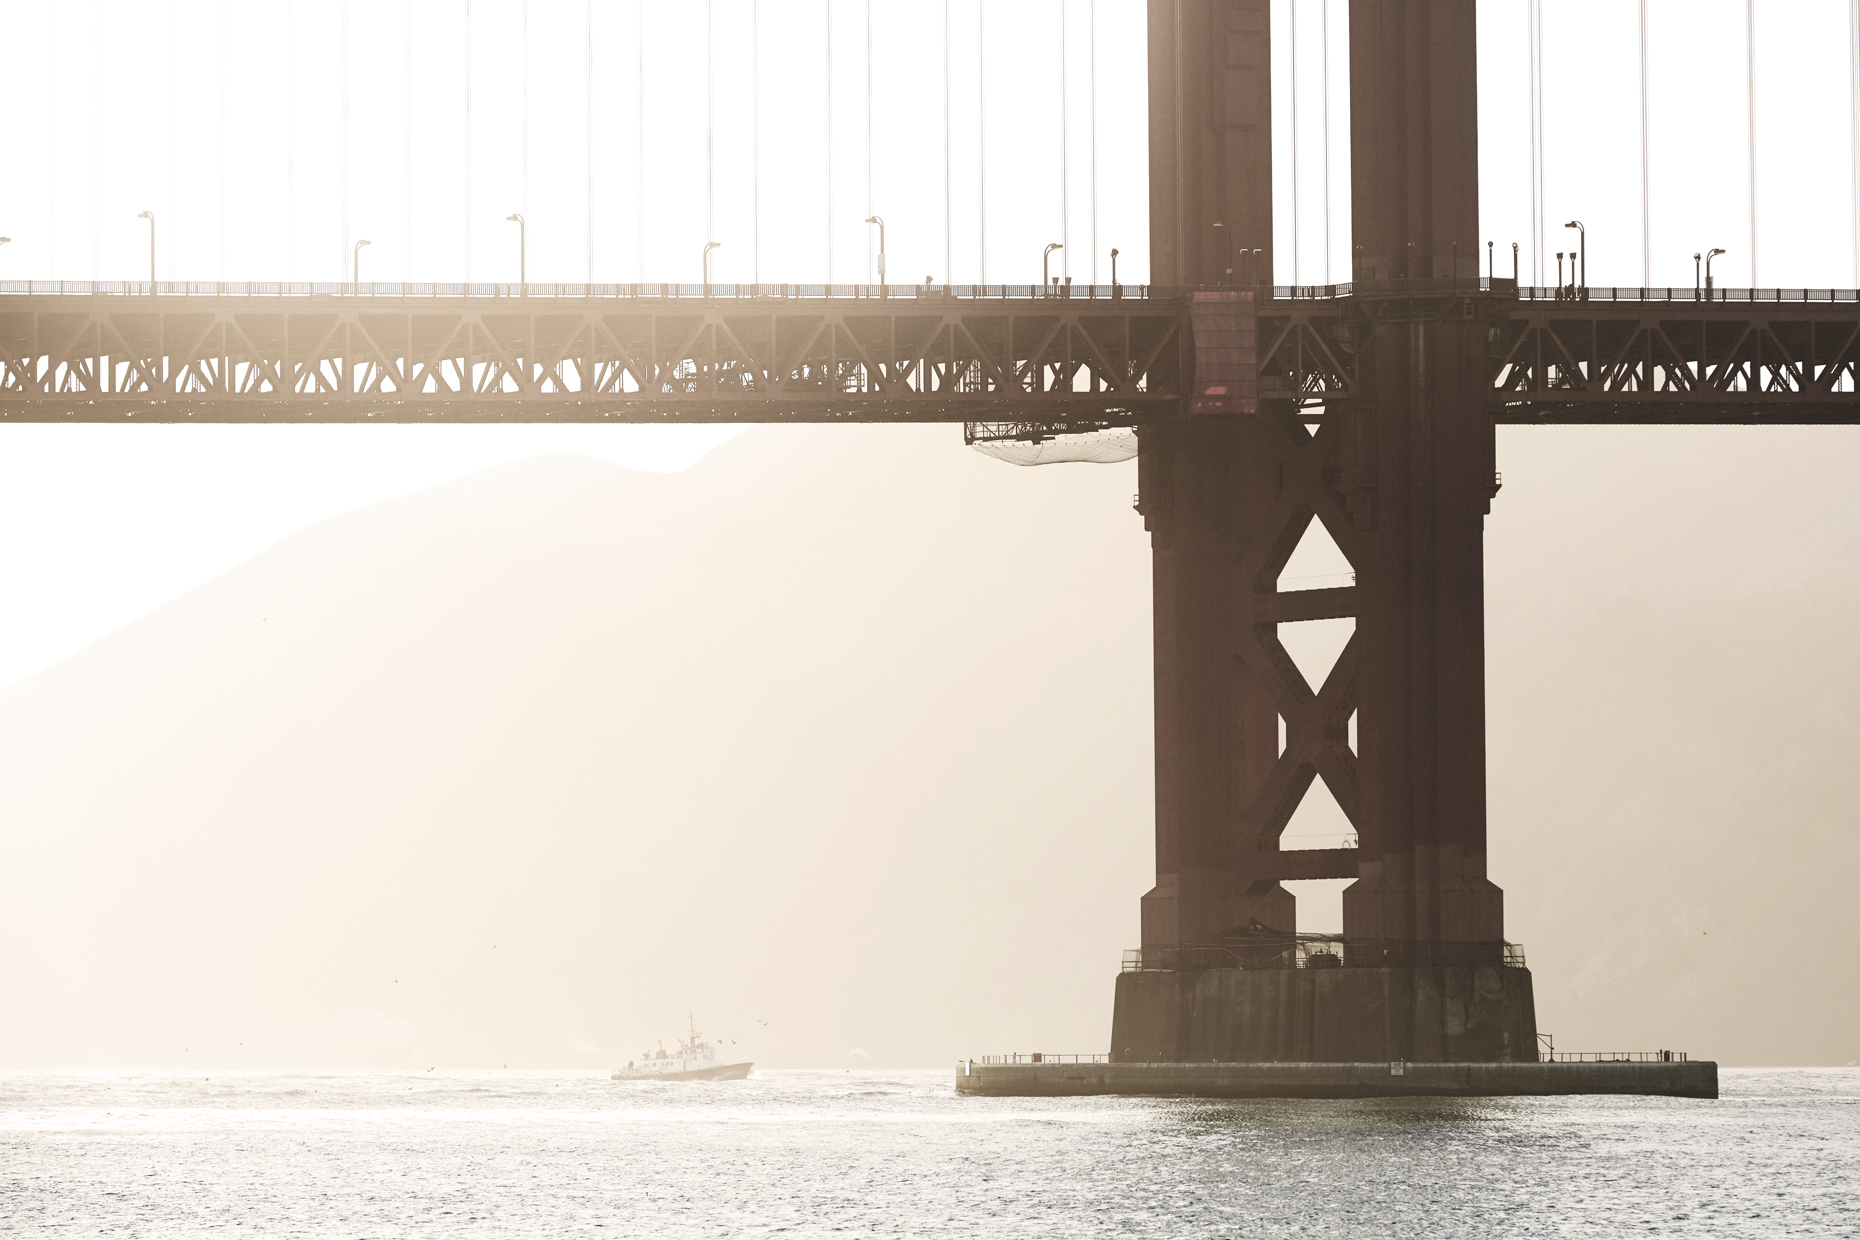 Travel Photography Derek Israelsen 002 Golden Gate Bridge